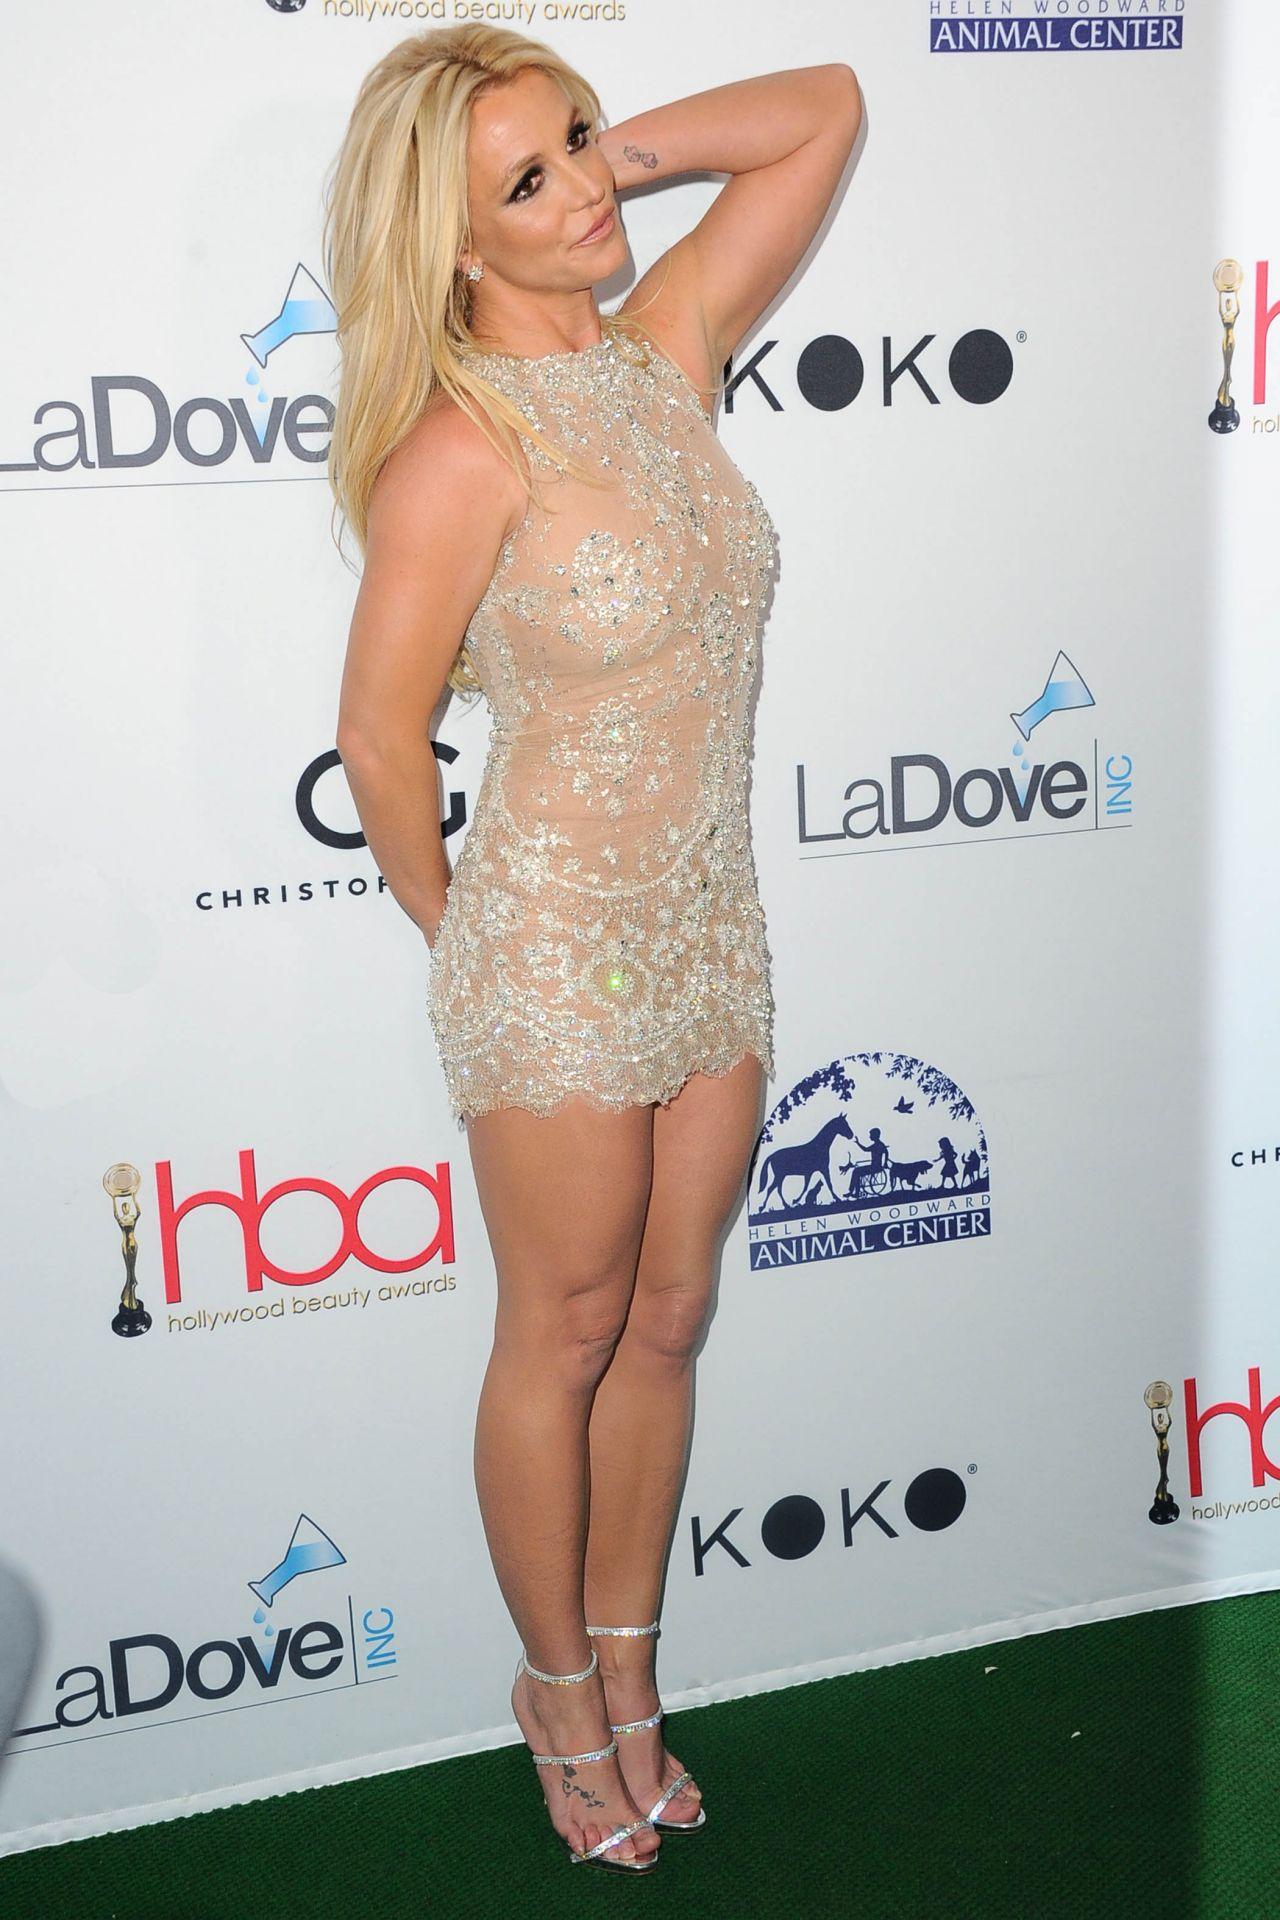 Britney Spears photo 7844 of 7985 pics, wallpaper - photo ... бритни спирс сейчас